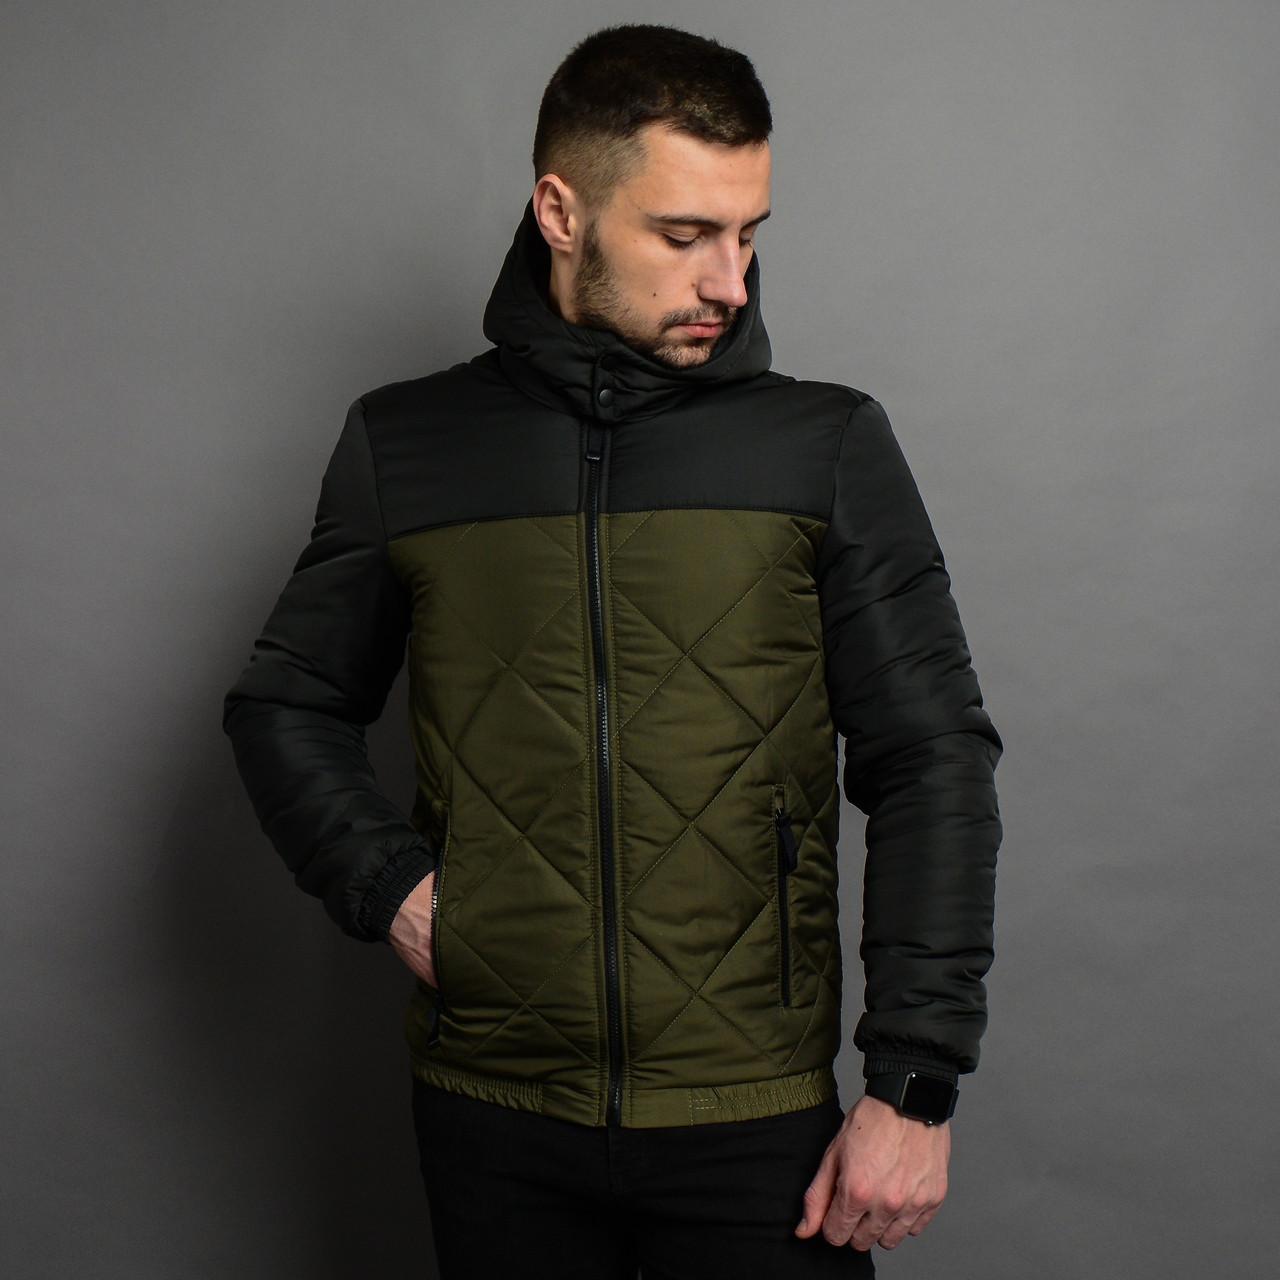 Куртка мужская. Куртка чоловіча. ТОП КАЧЕСТВО!!!, фото 1